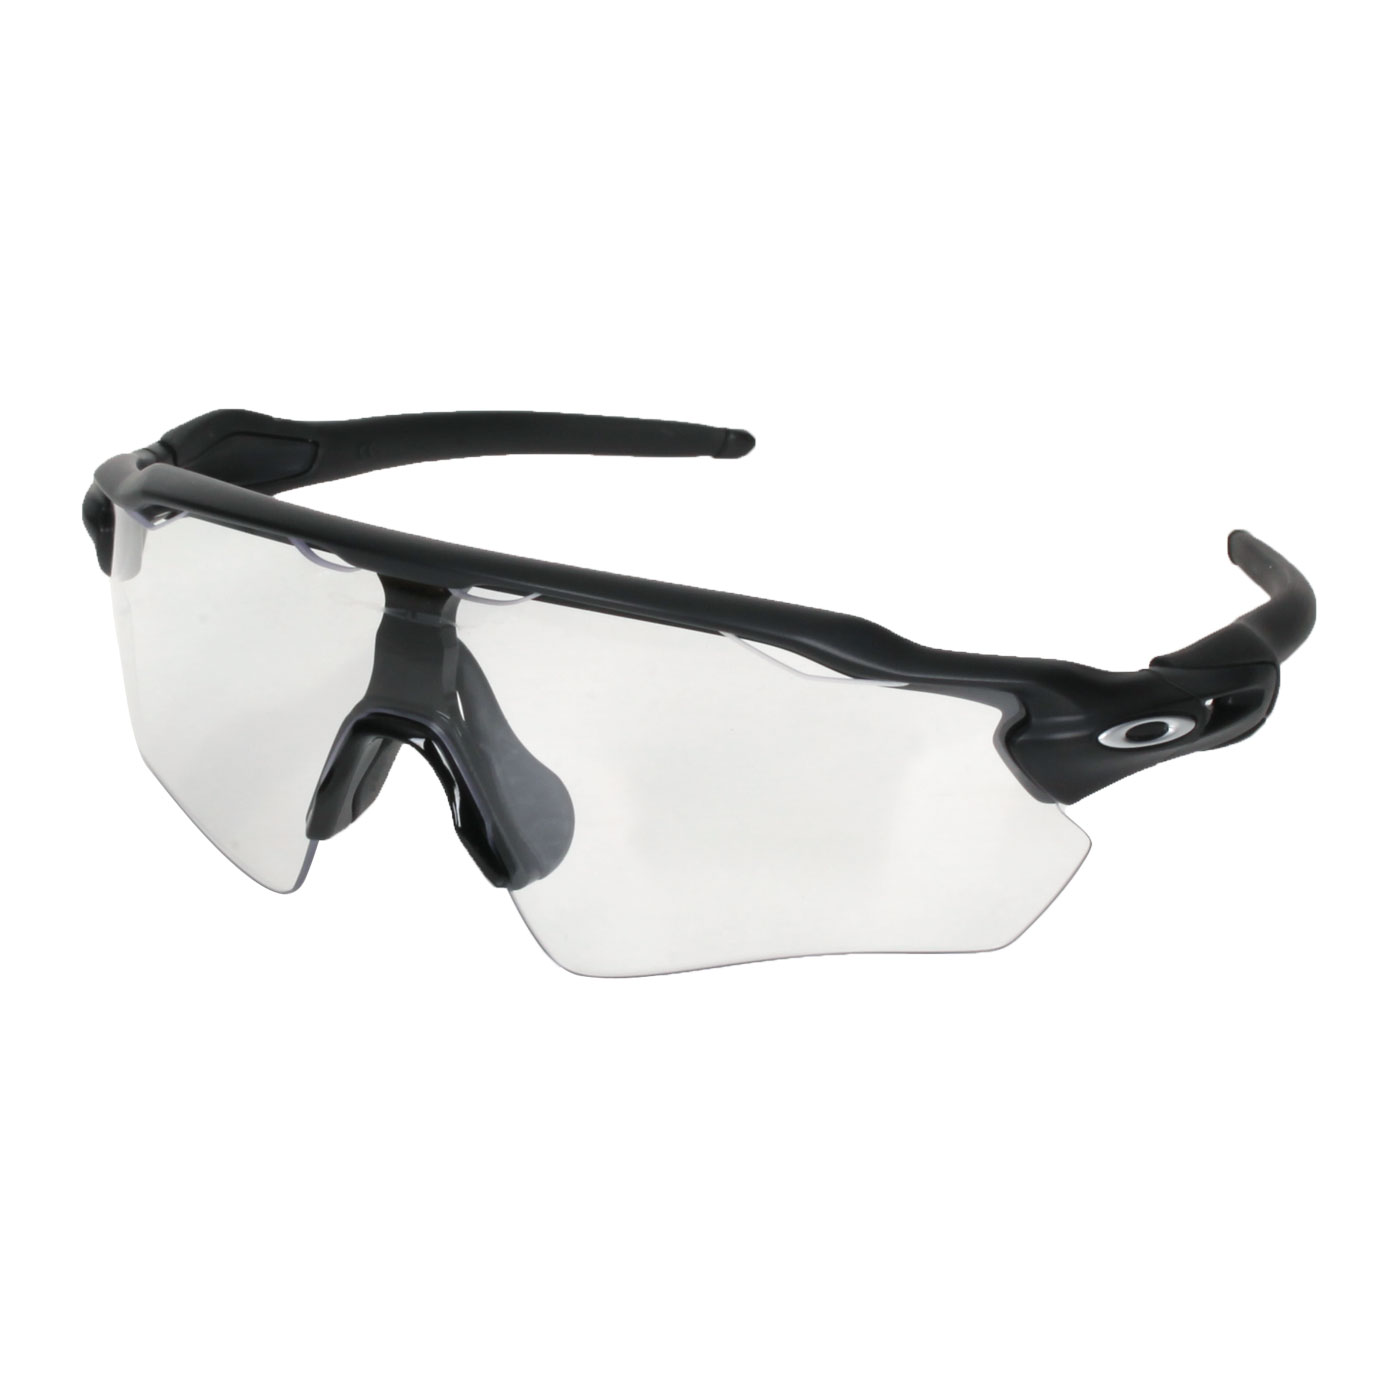 OAKLEY RADAR EV PATH 一般太陽眼鏡(附硬盒鼻墊) OAK-OO9208-7438 - 黑銀